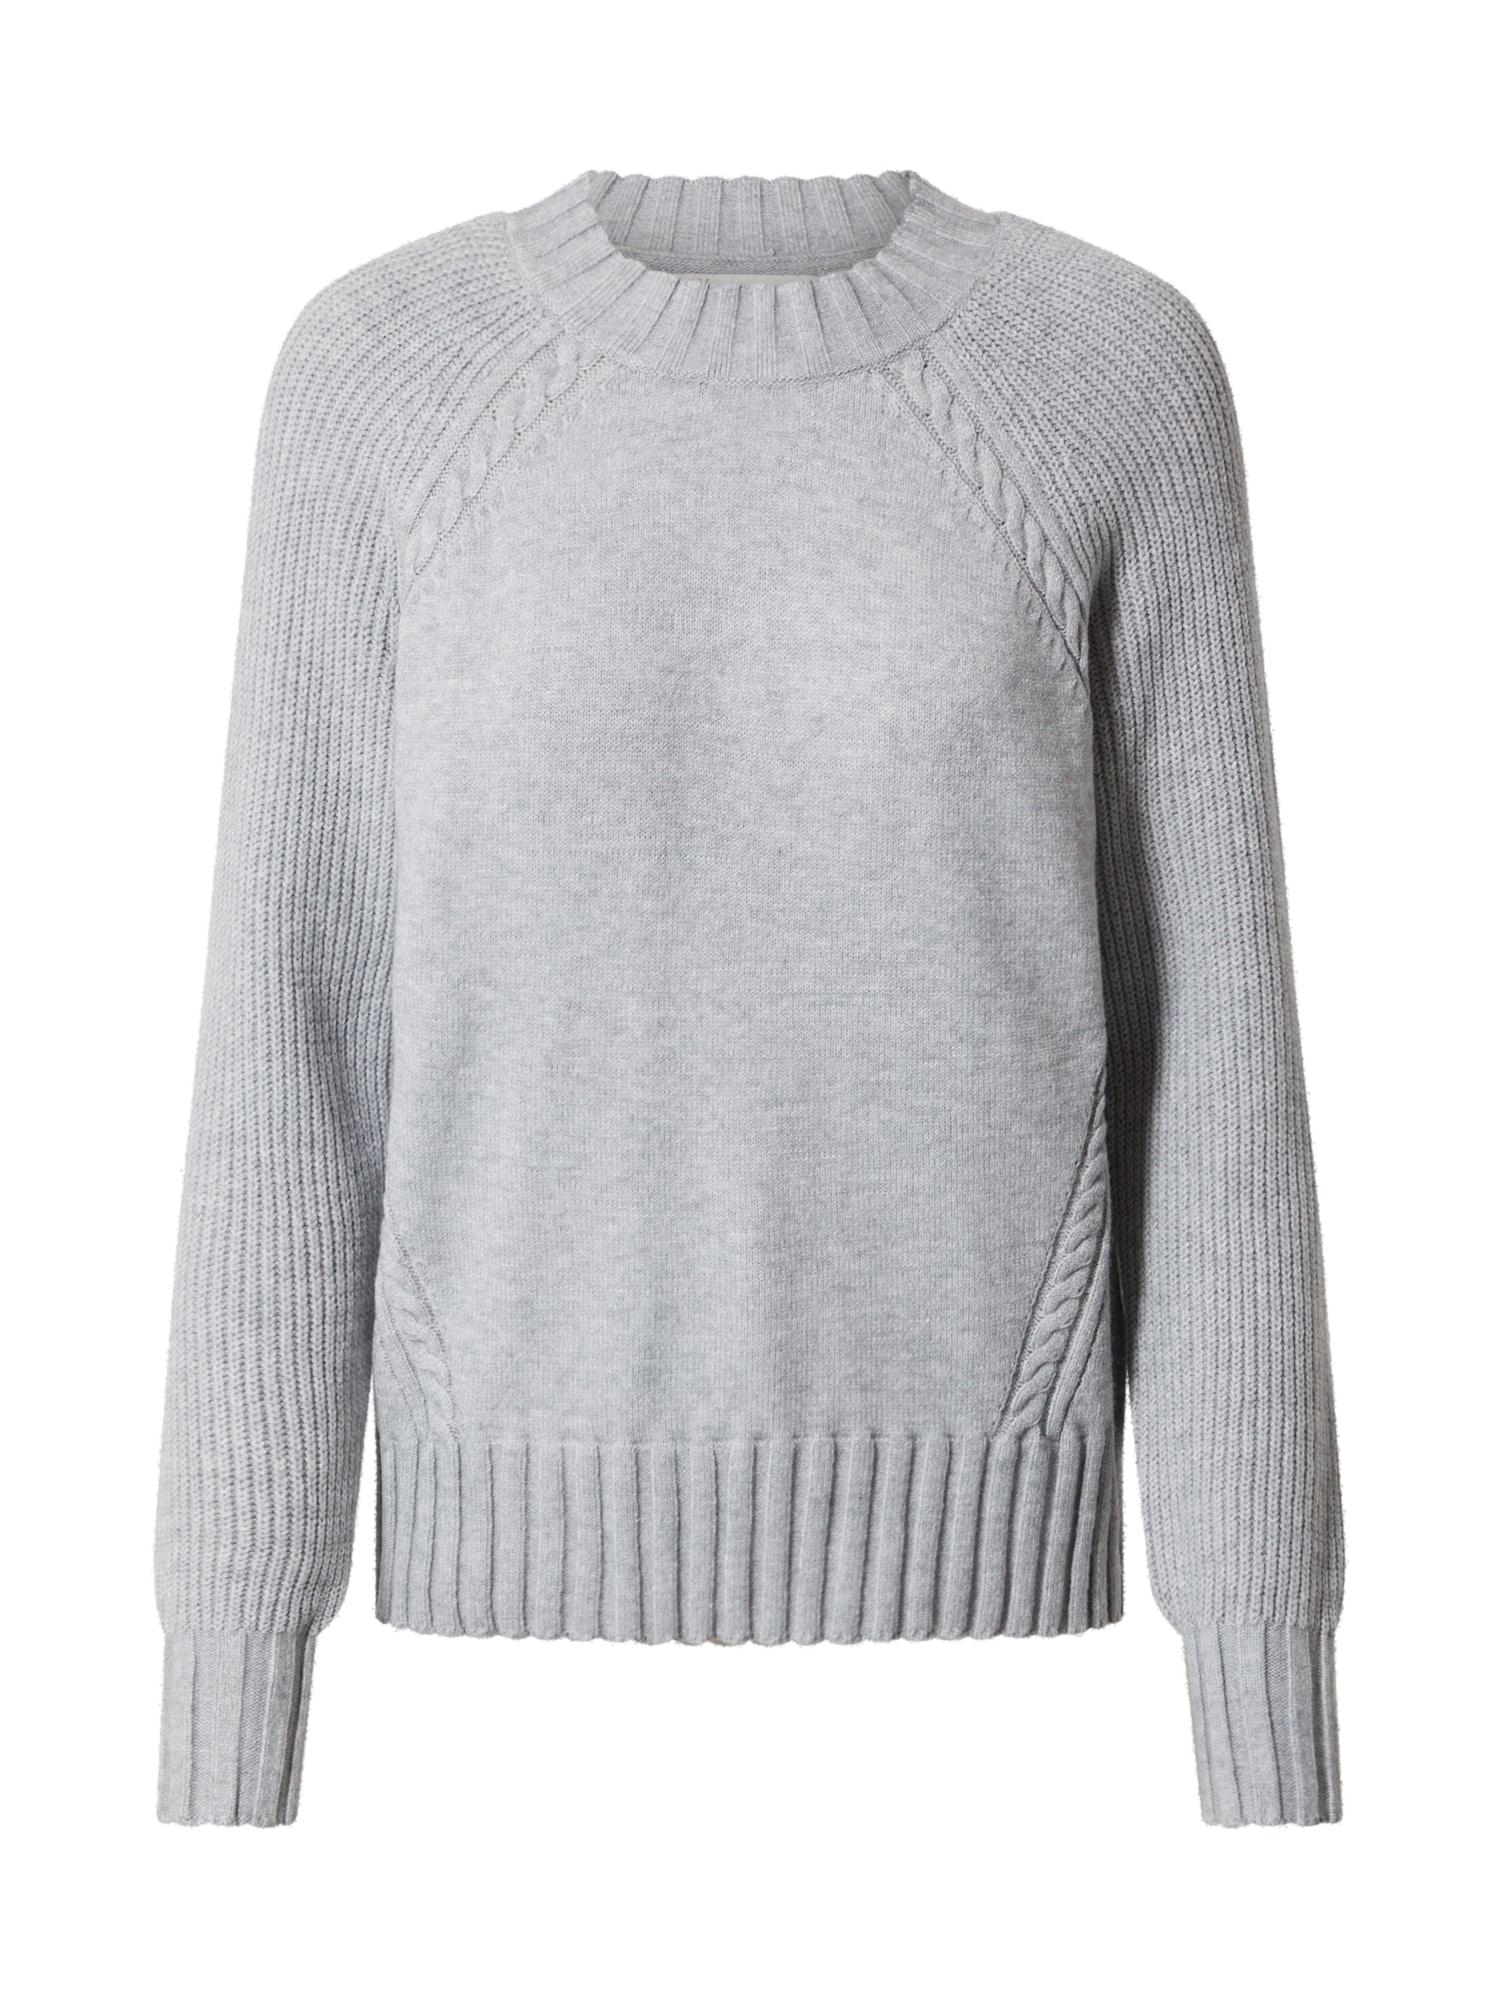 ONLY Megztinis 'Sandy' šviesiai pilka